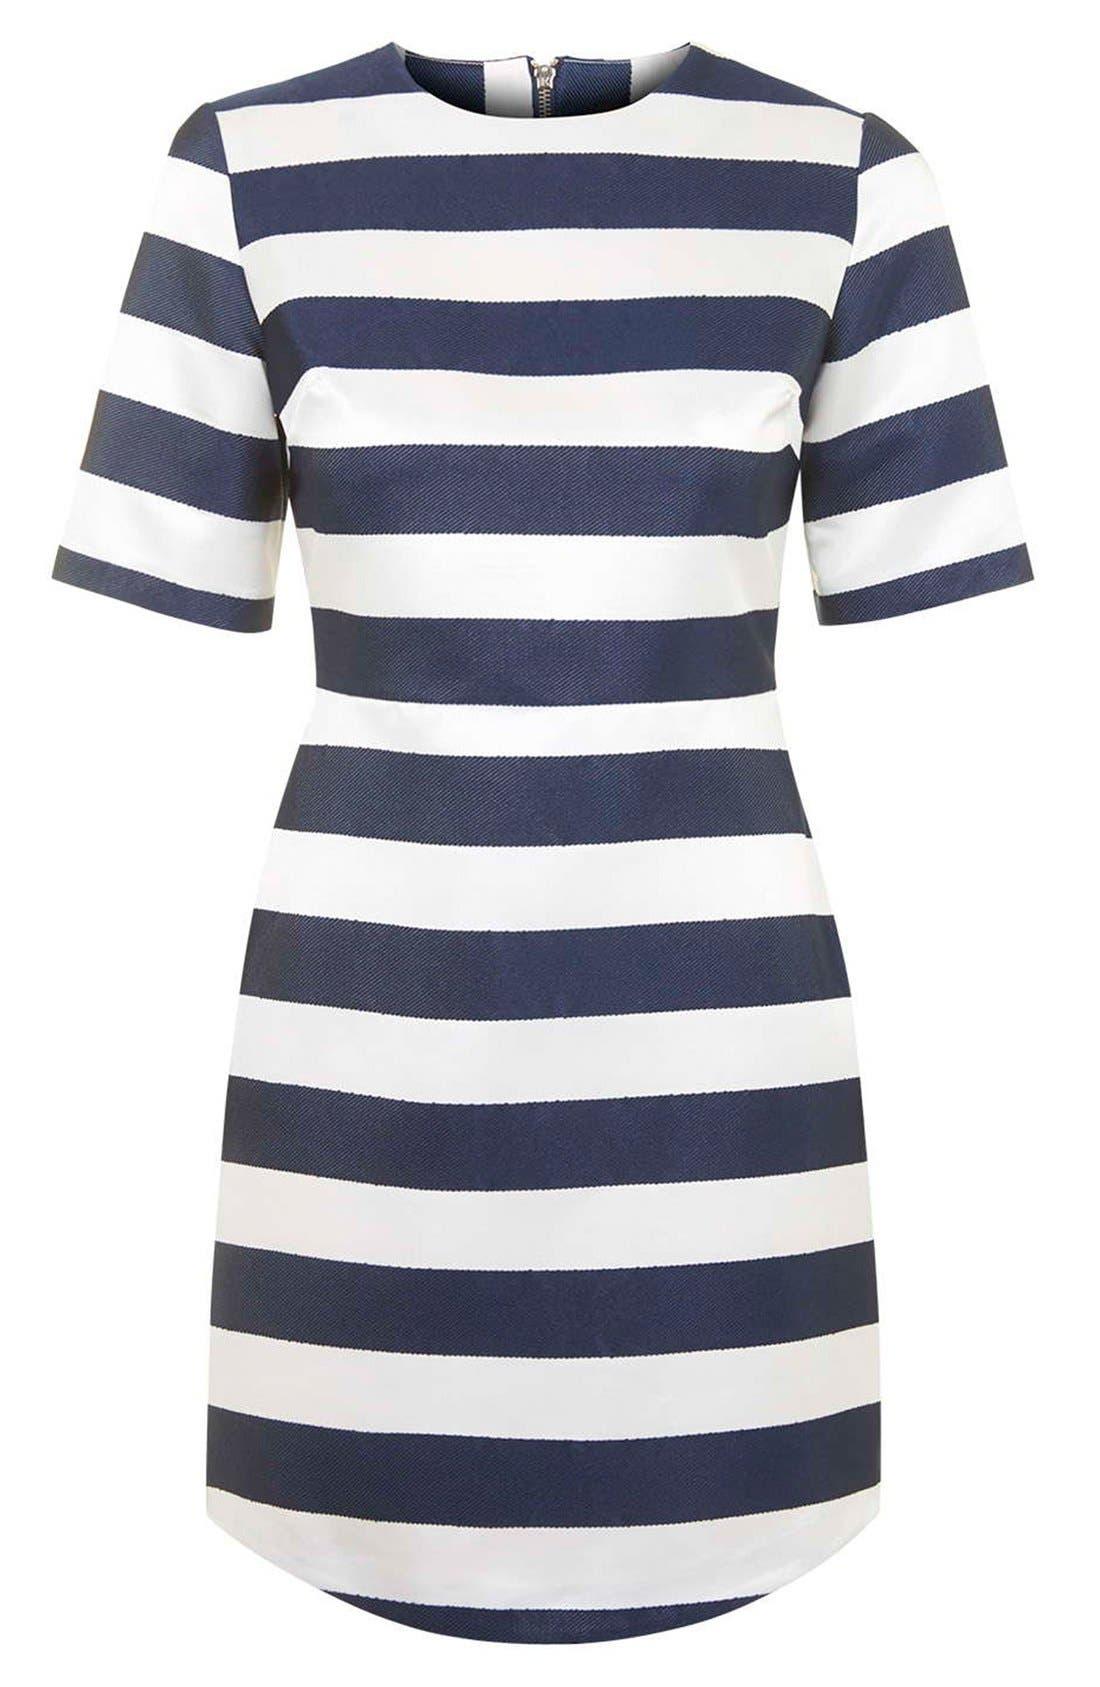 TOPSHOP, Twill & Satin Stripe Dress, Alternate thumbnail 3, color, 410